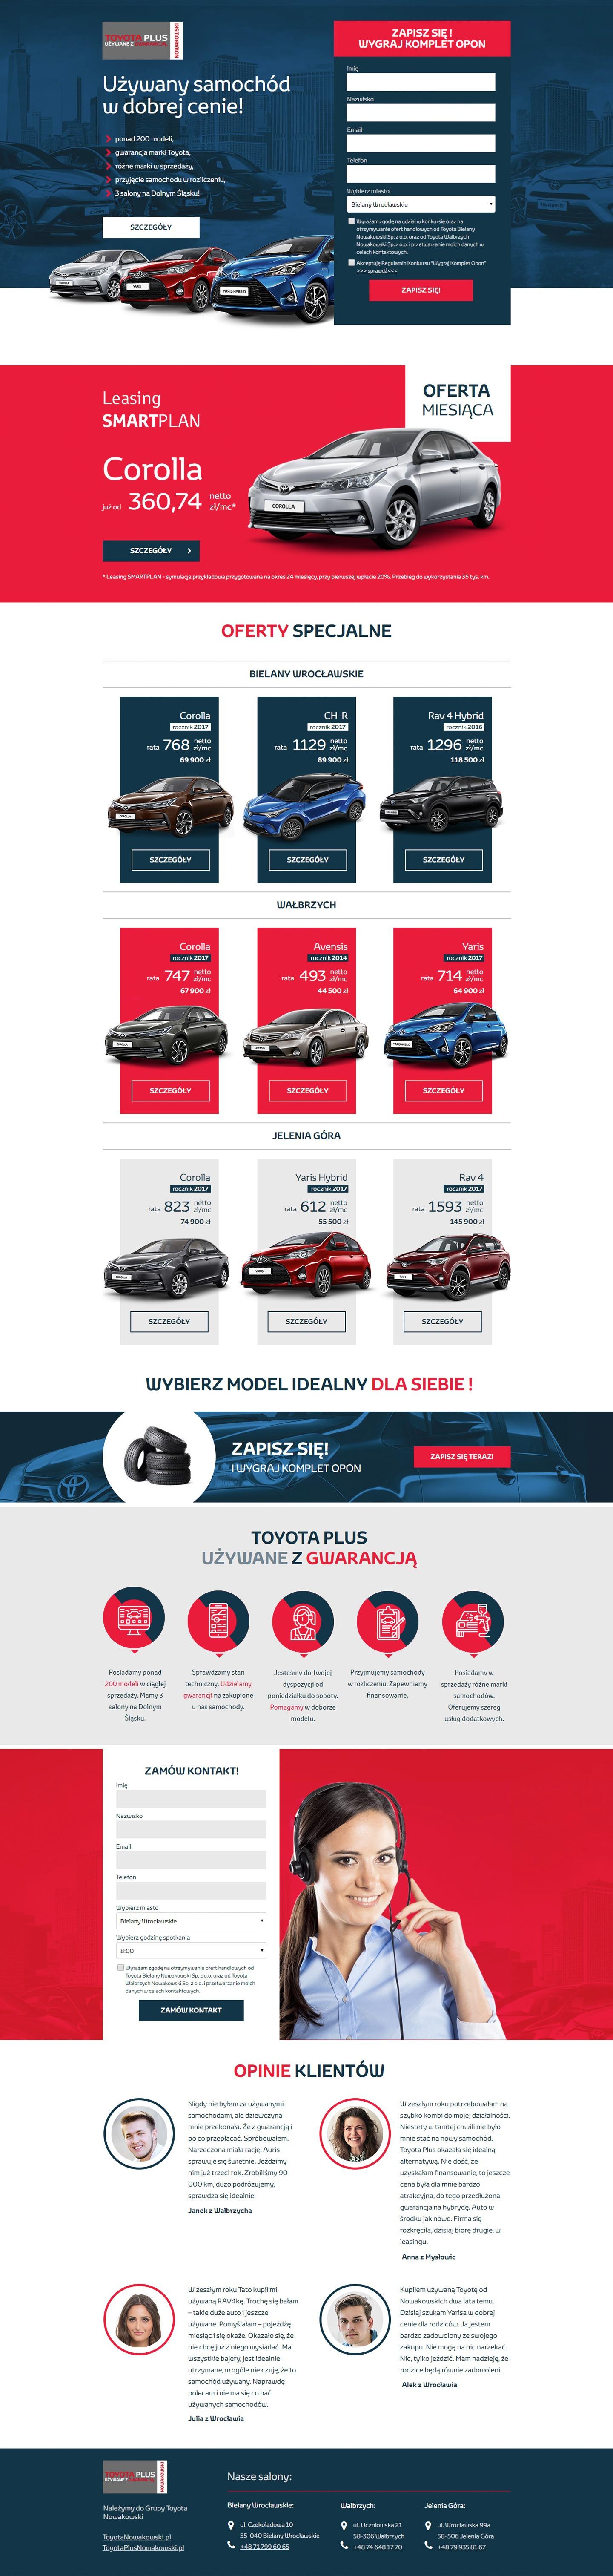 Toyota Plus Landing Page